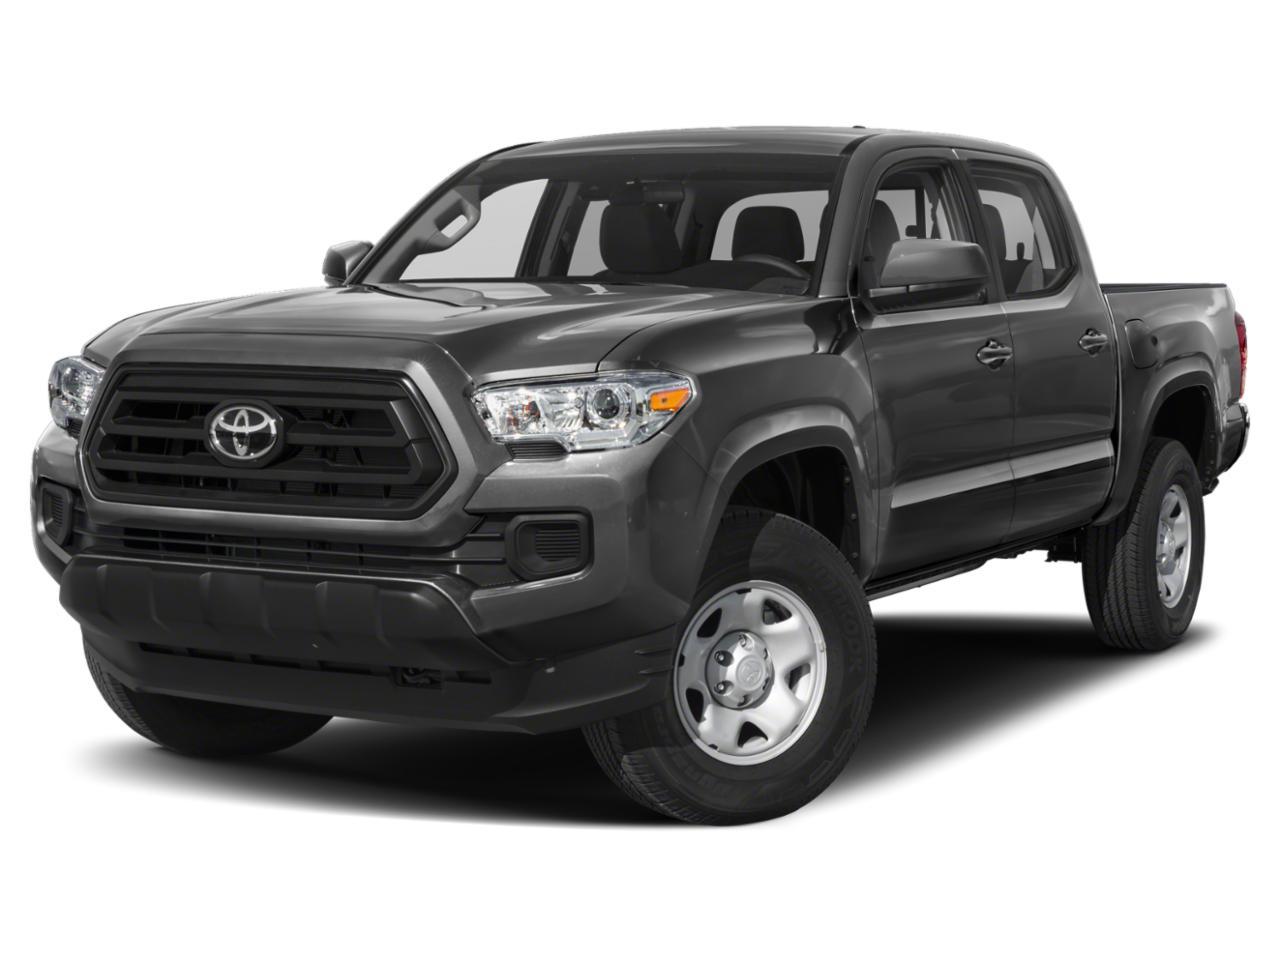 2020 Toyota Tacoma 4WD Vehicle Photo in Trinidad, CO 81082